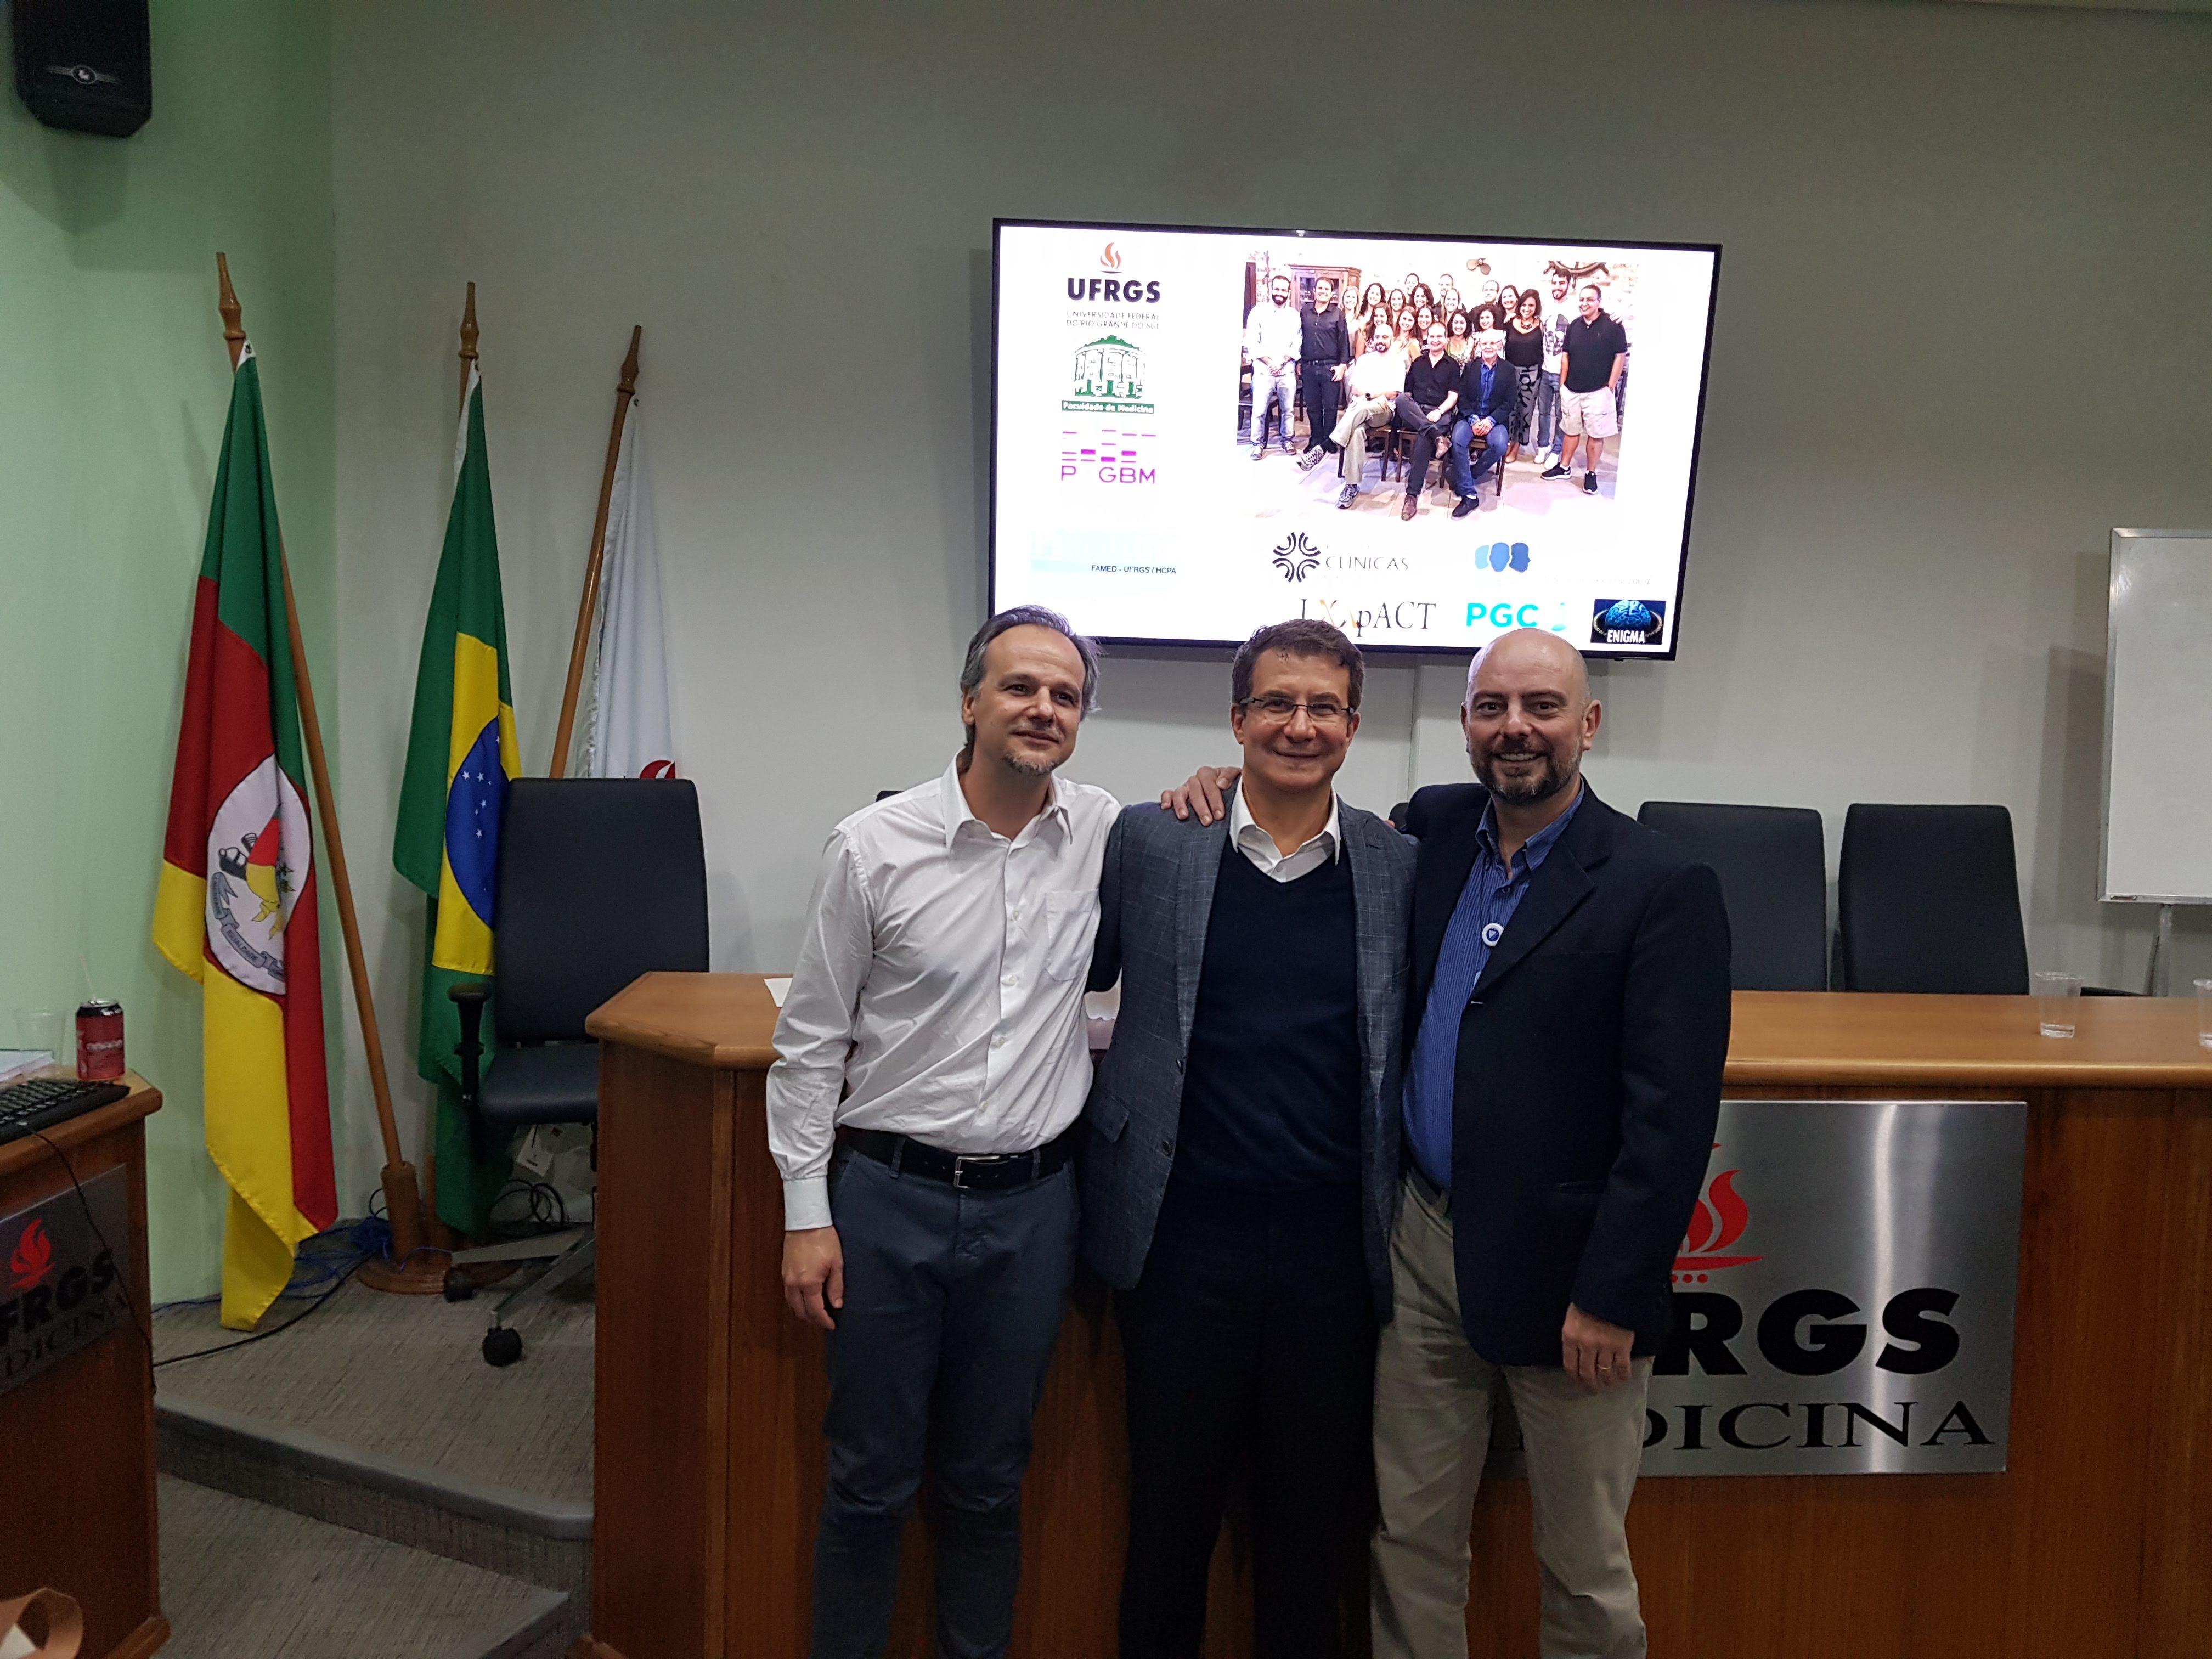 Banca Eduardo Viola UFRGS 2019